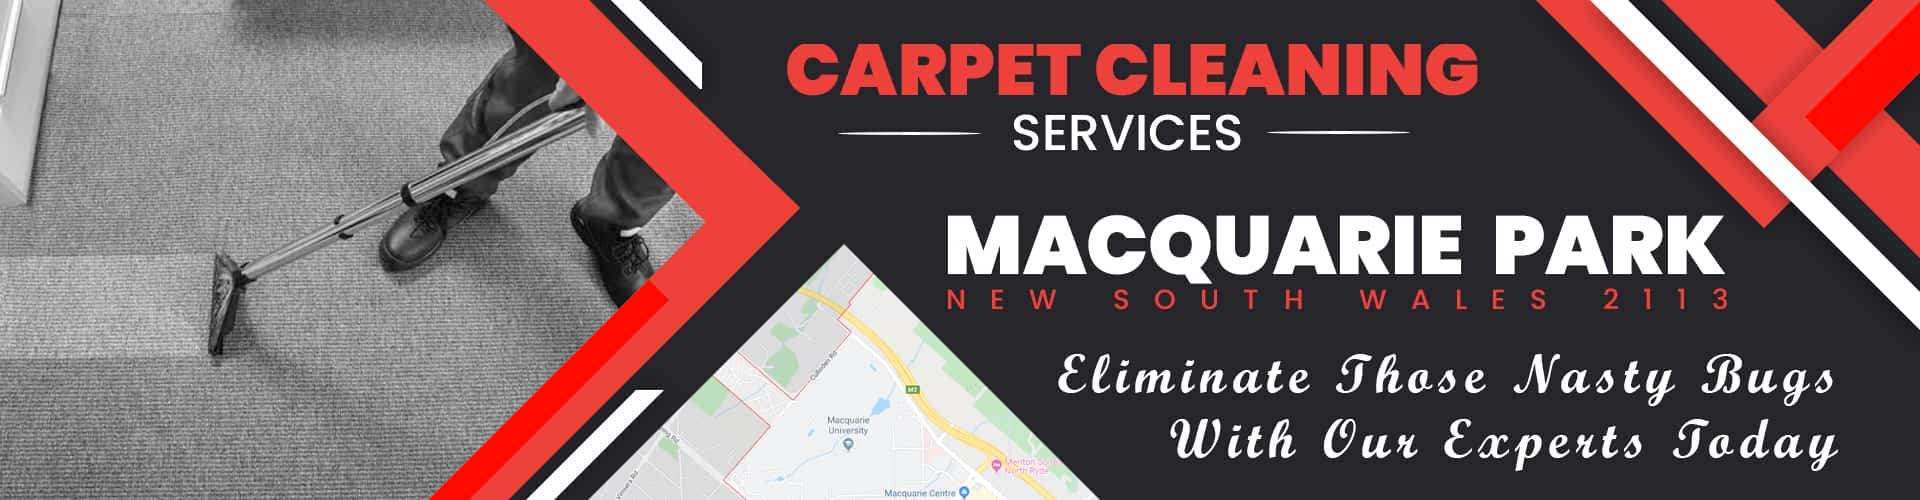 Carpet Cleaning Macquarie-Park